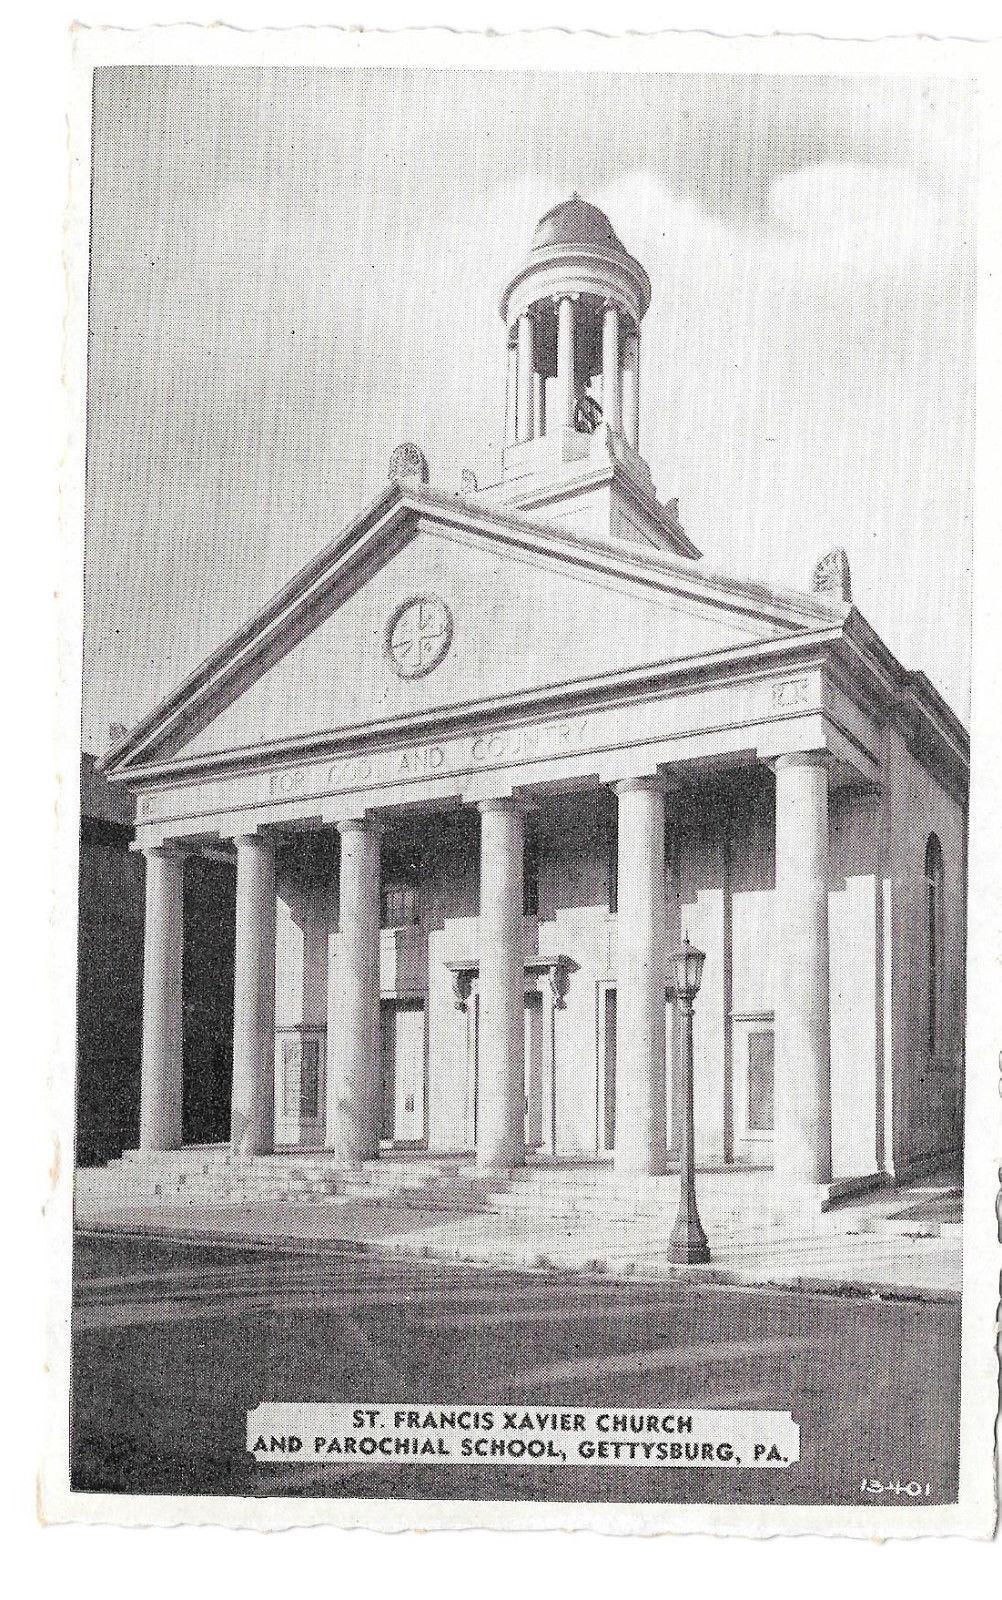 Gettysburg PA St Francis Xavier Church Civil War Hospital Vtg Buohl Postcard